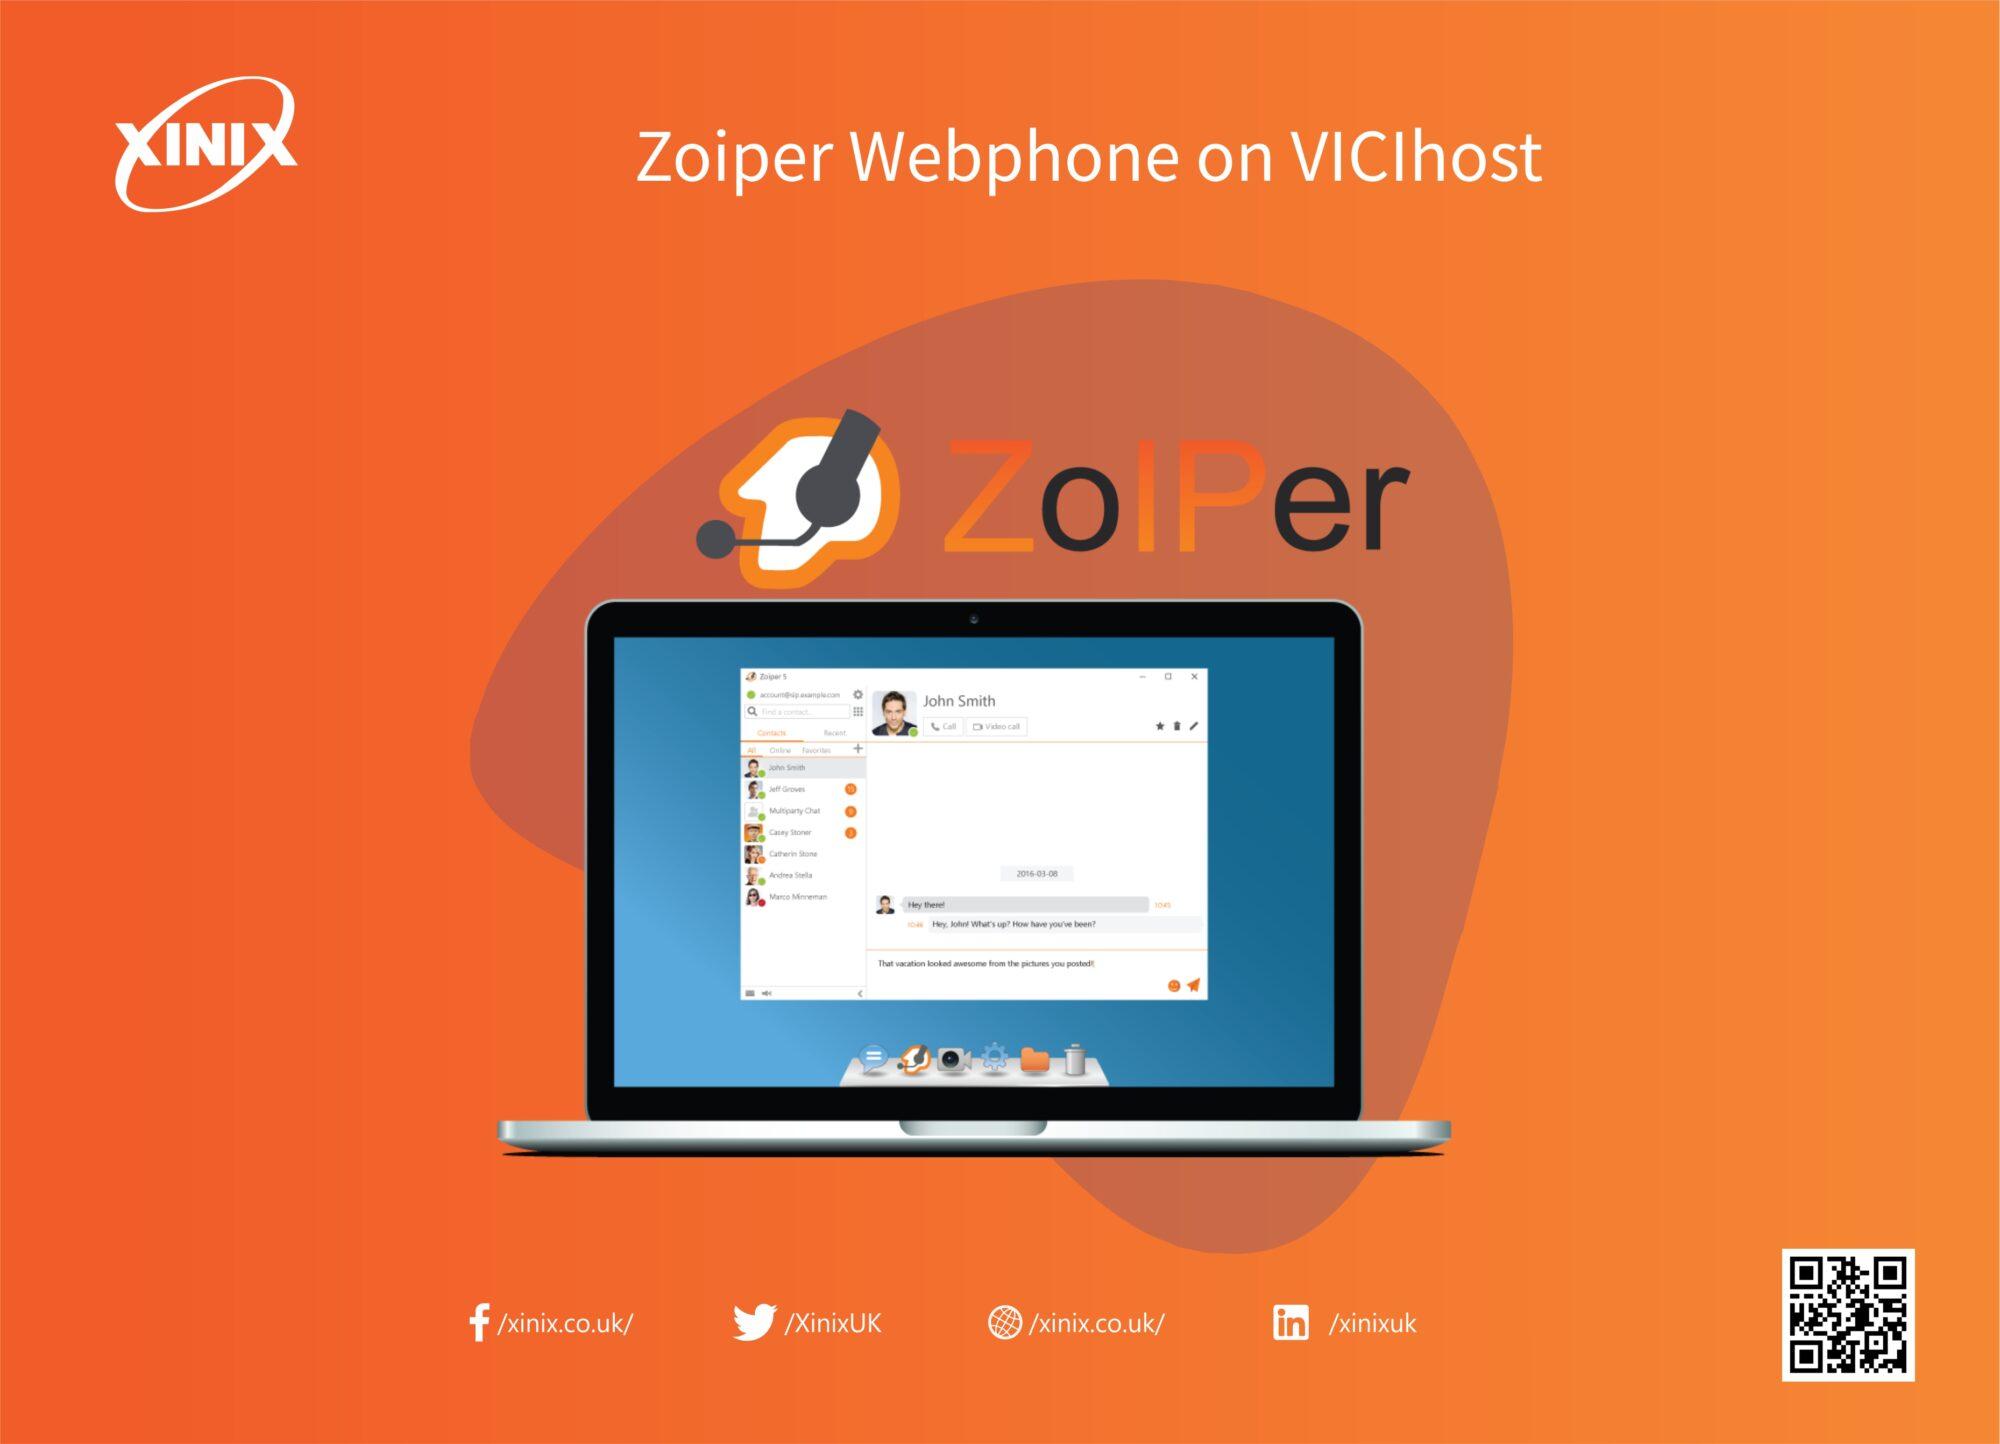 Zoiper Webphone on VICIhost